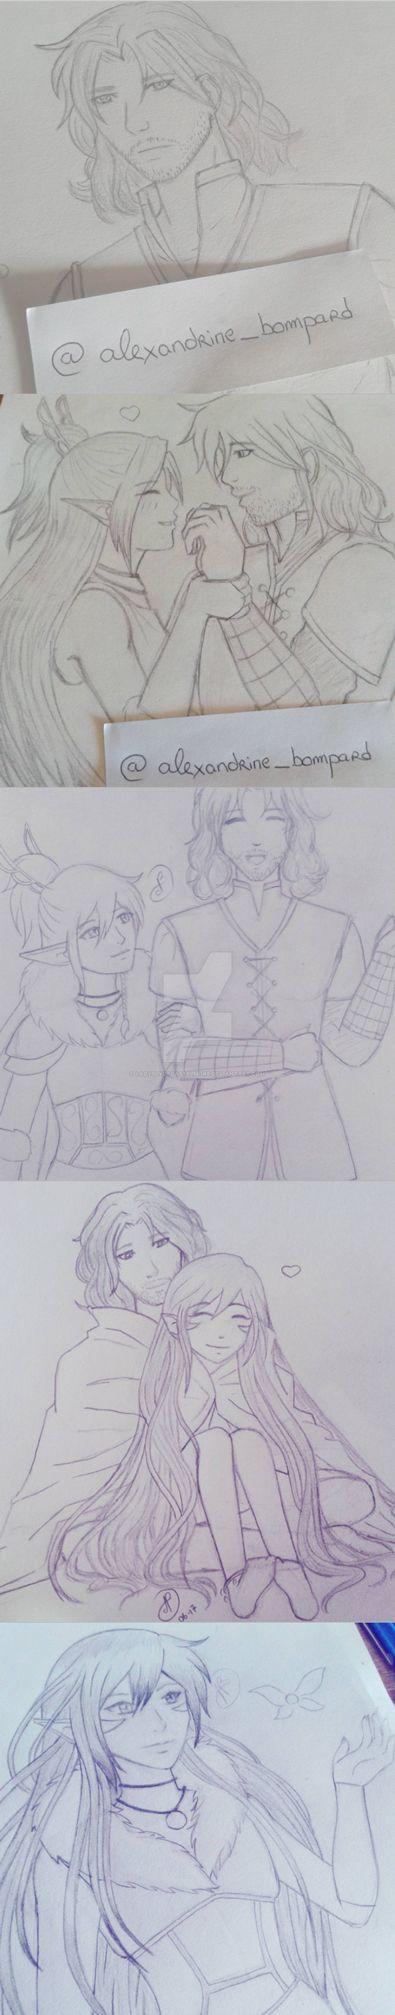 Insta-sketch by LadySlyOfCastelmore